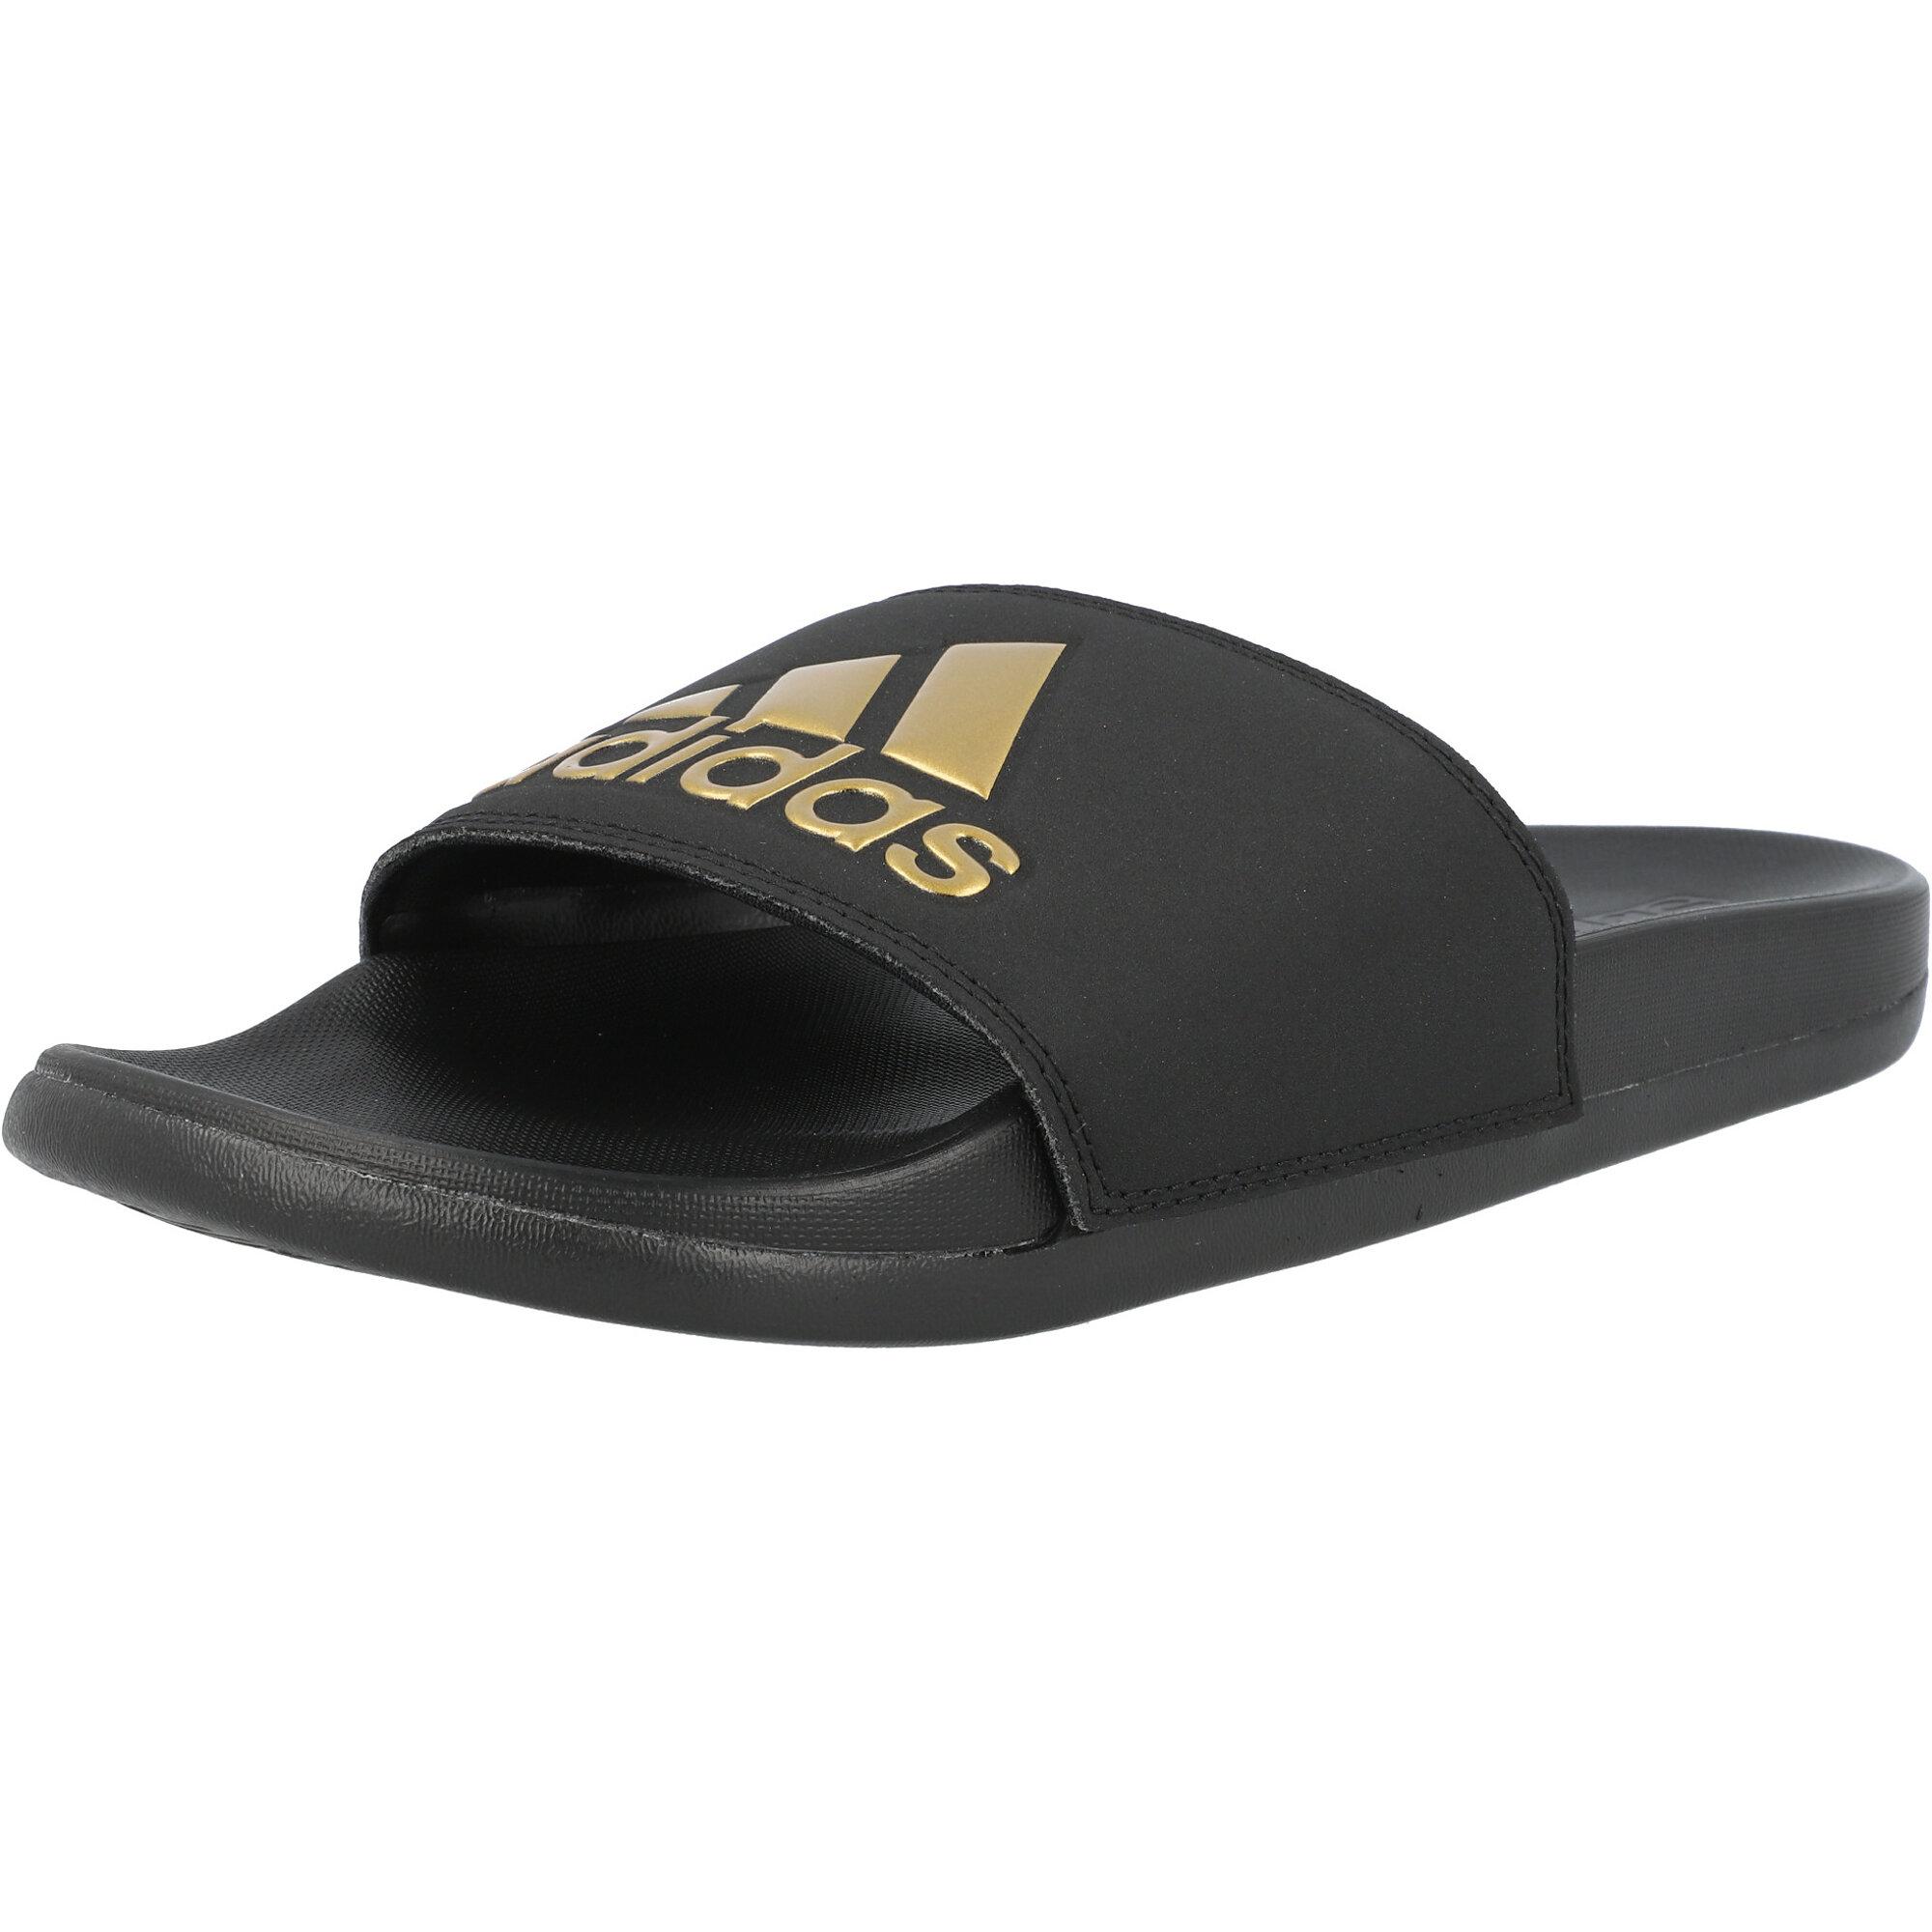 adidas adilette Comfort Black/Gold Metallic Synthetic